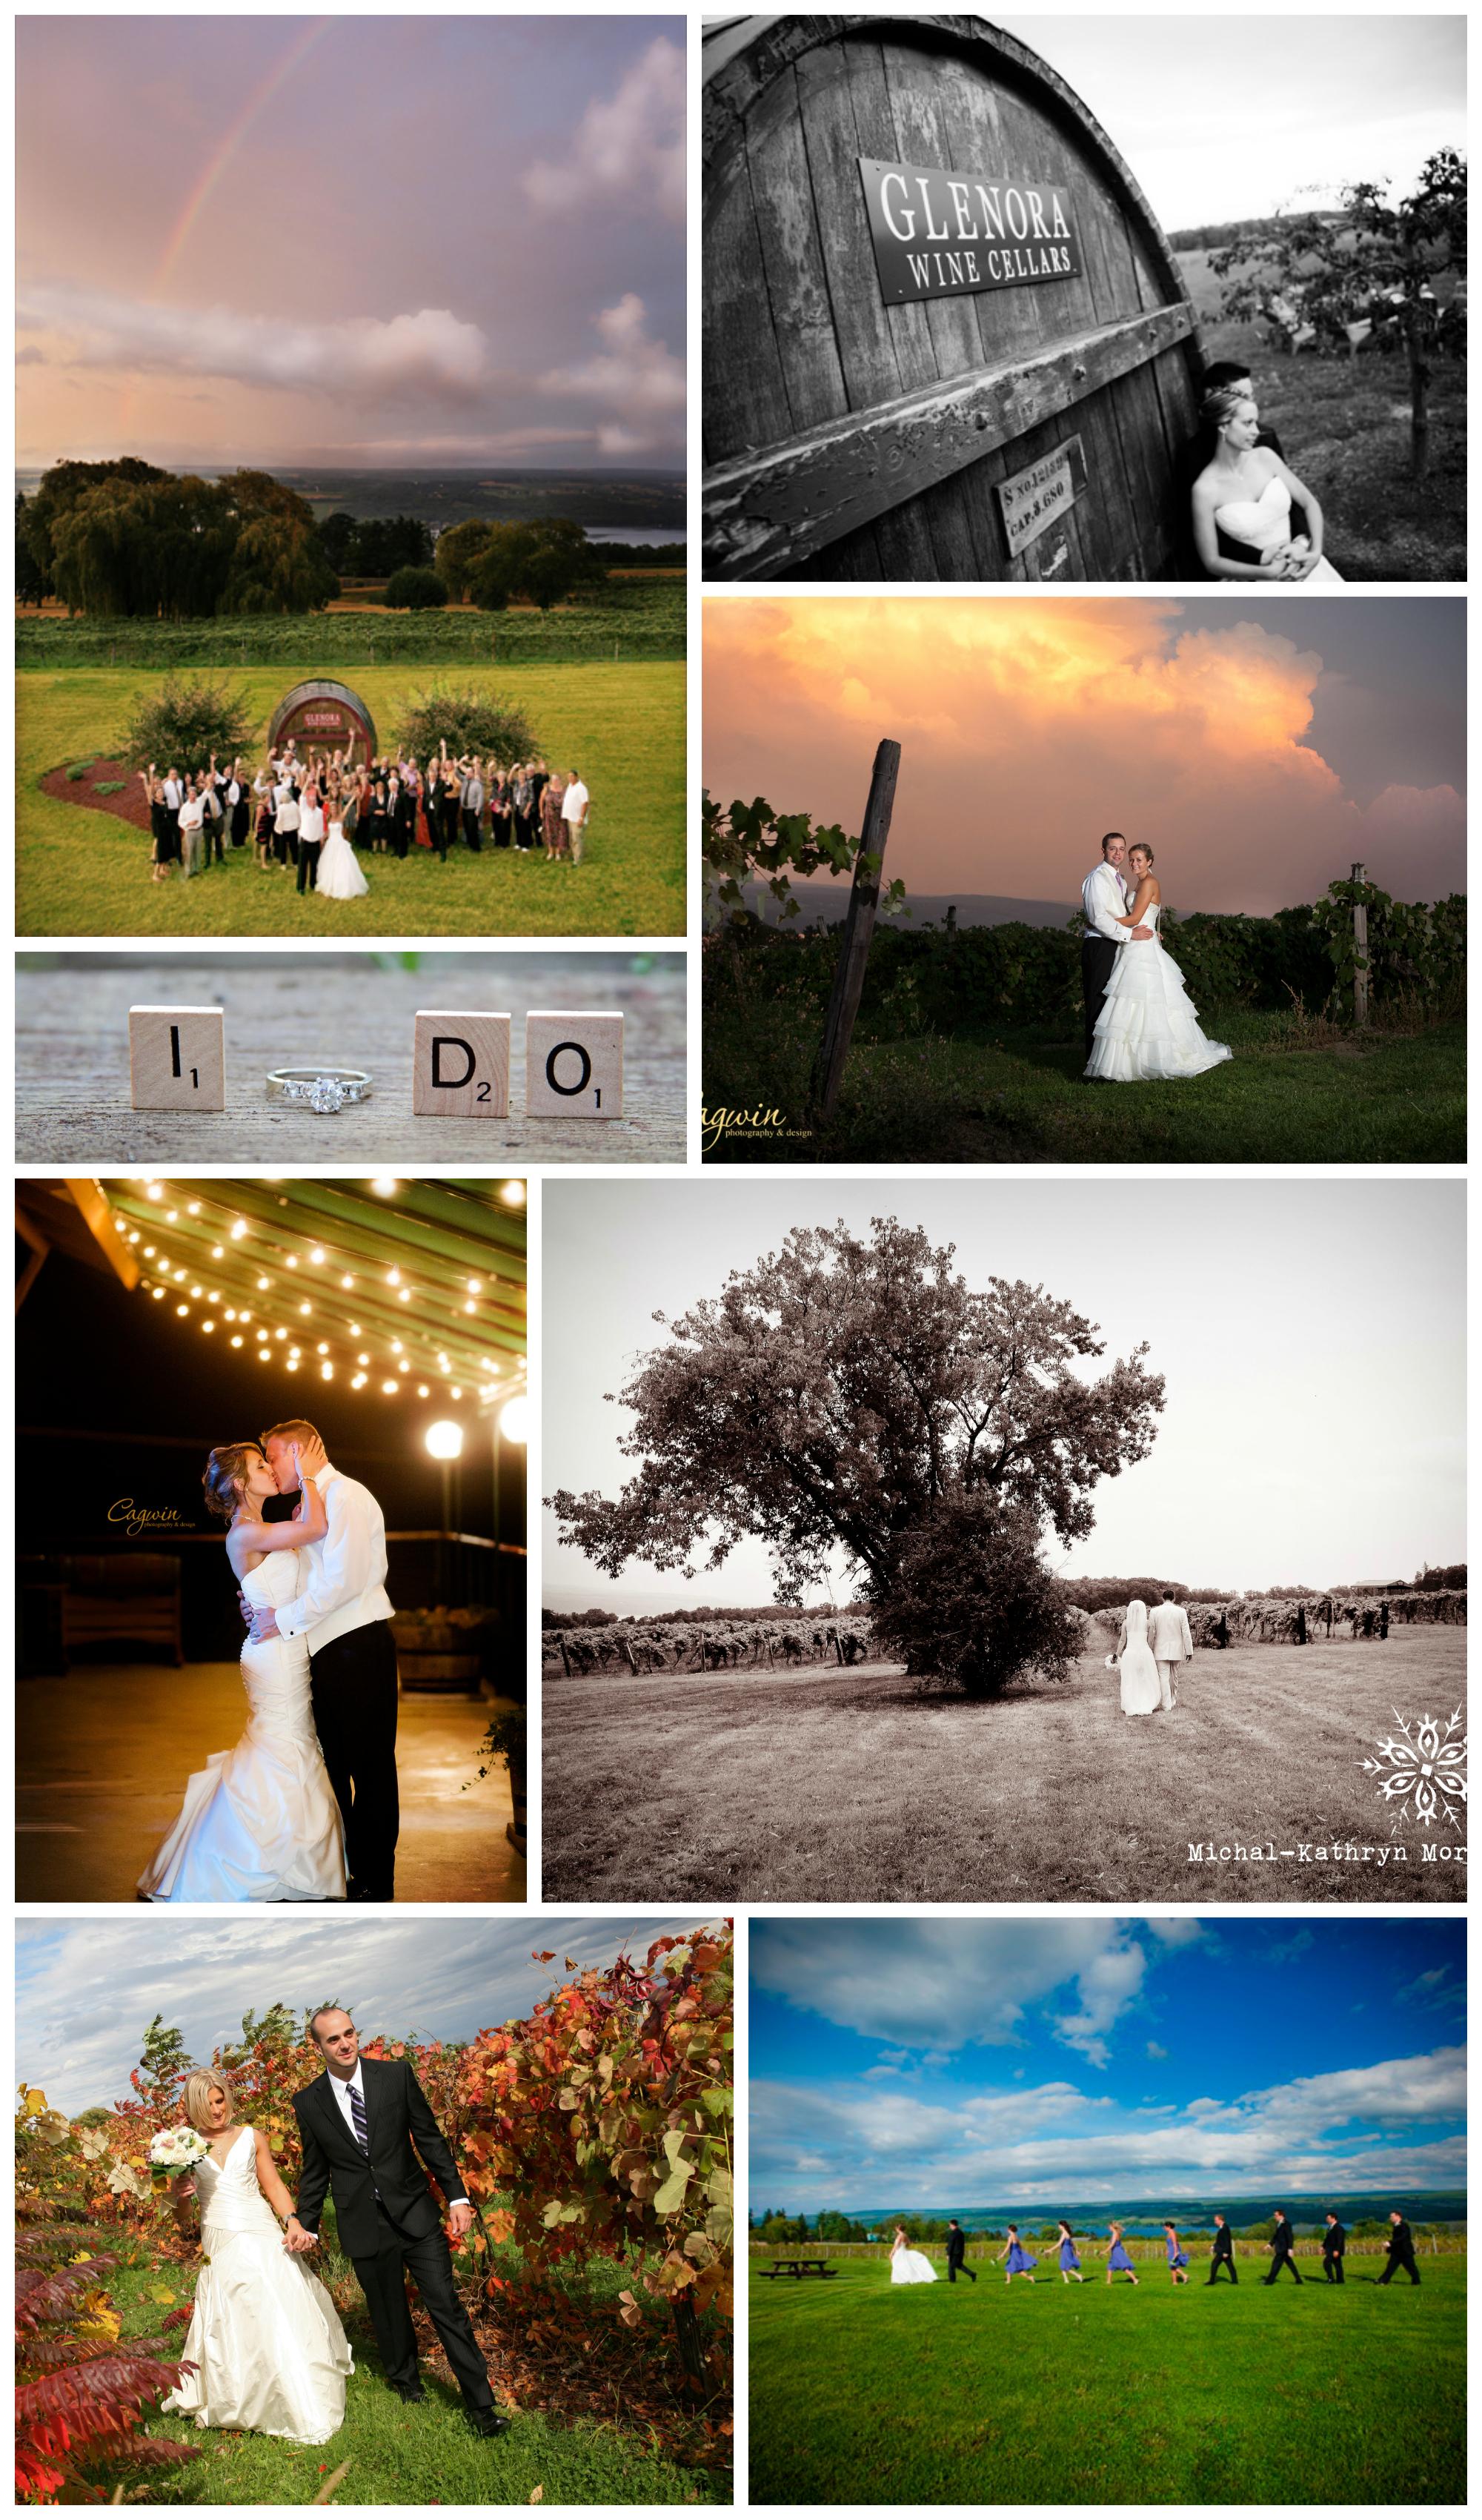 Glenora Wine Cellars Wedding Collage